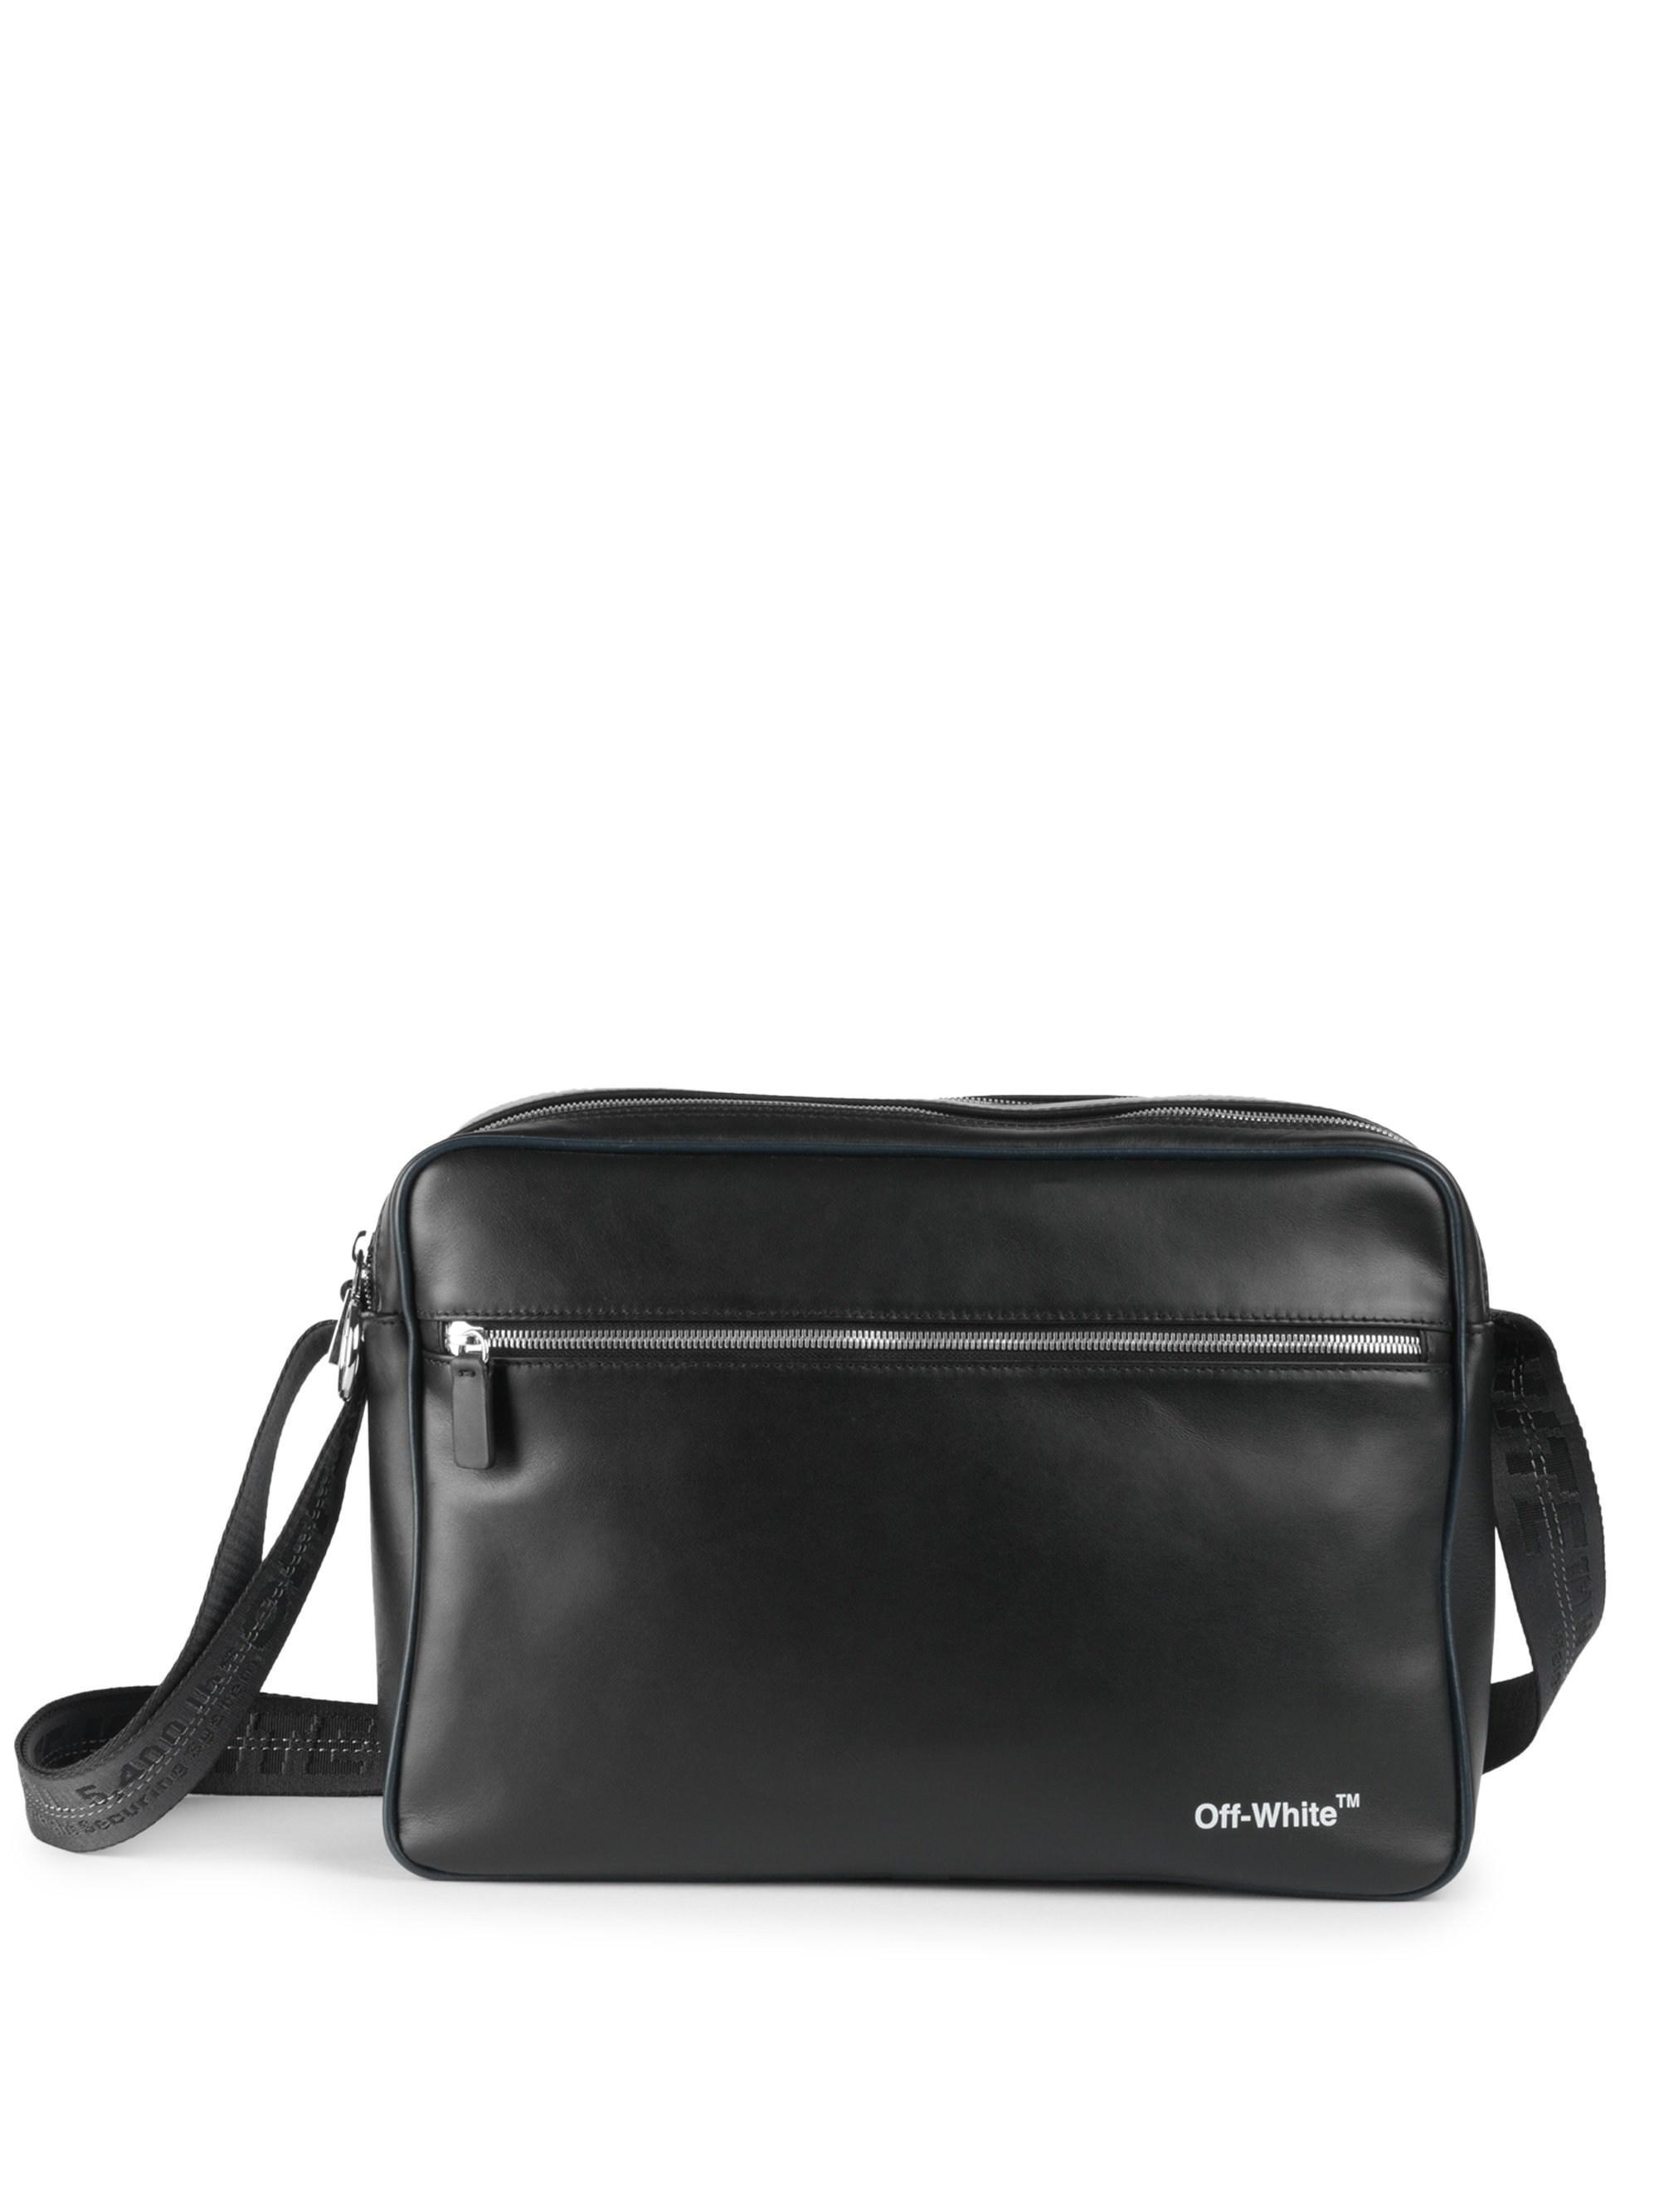 866ac6da228a Off-White c o Virgil Abloh. Men s Leather Messenger Bag - Black White